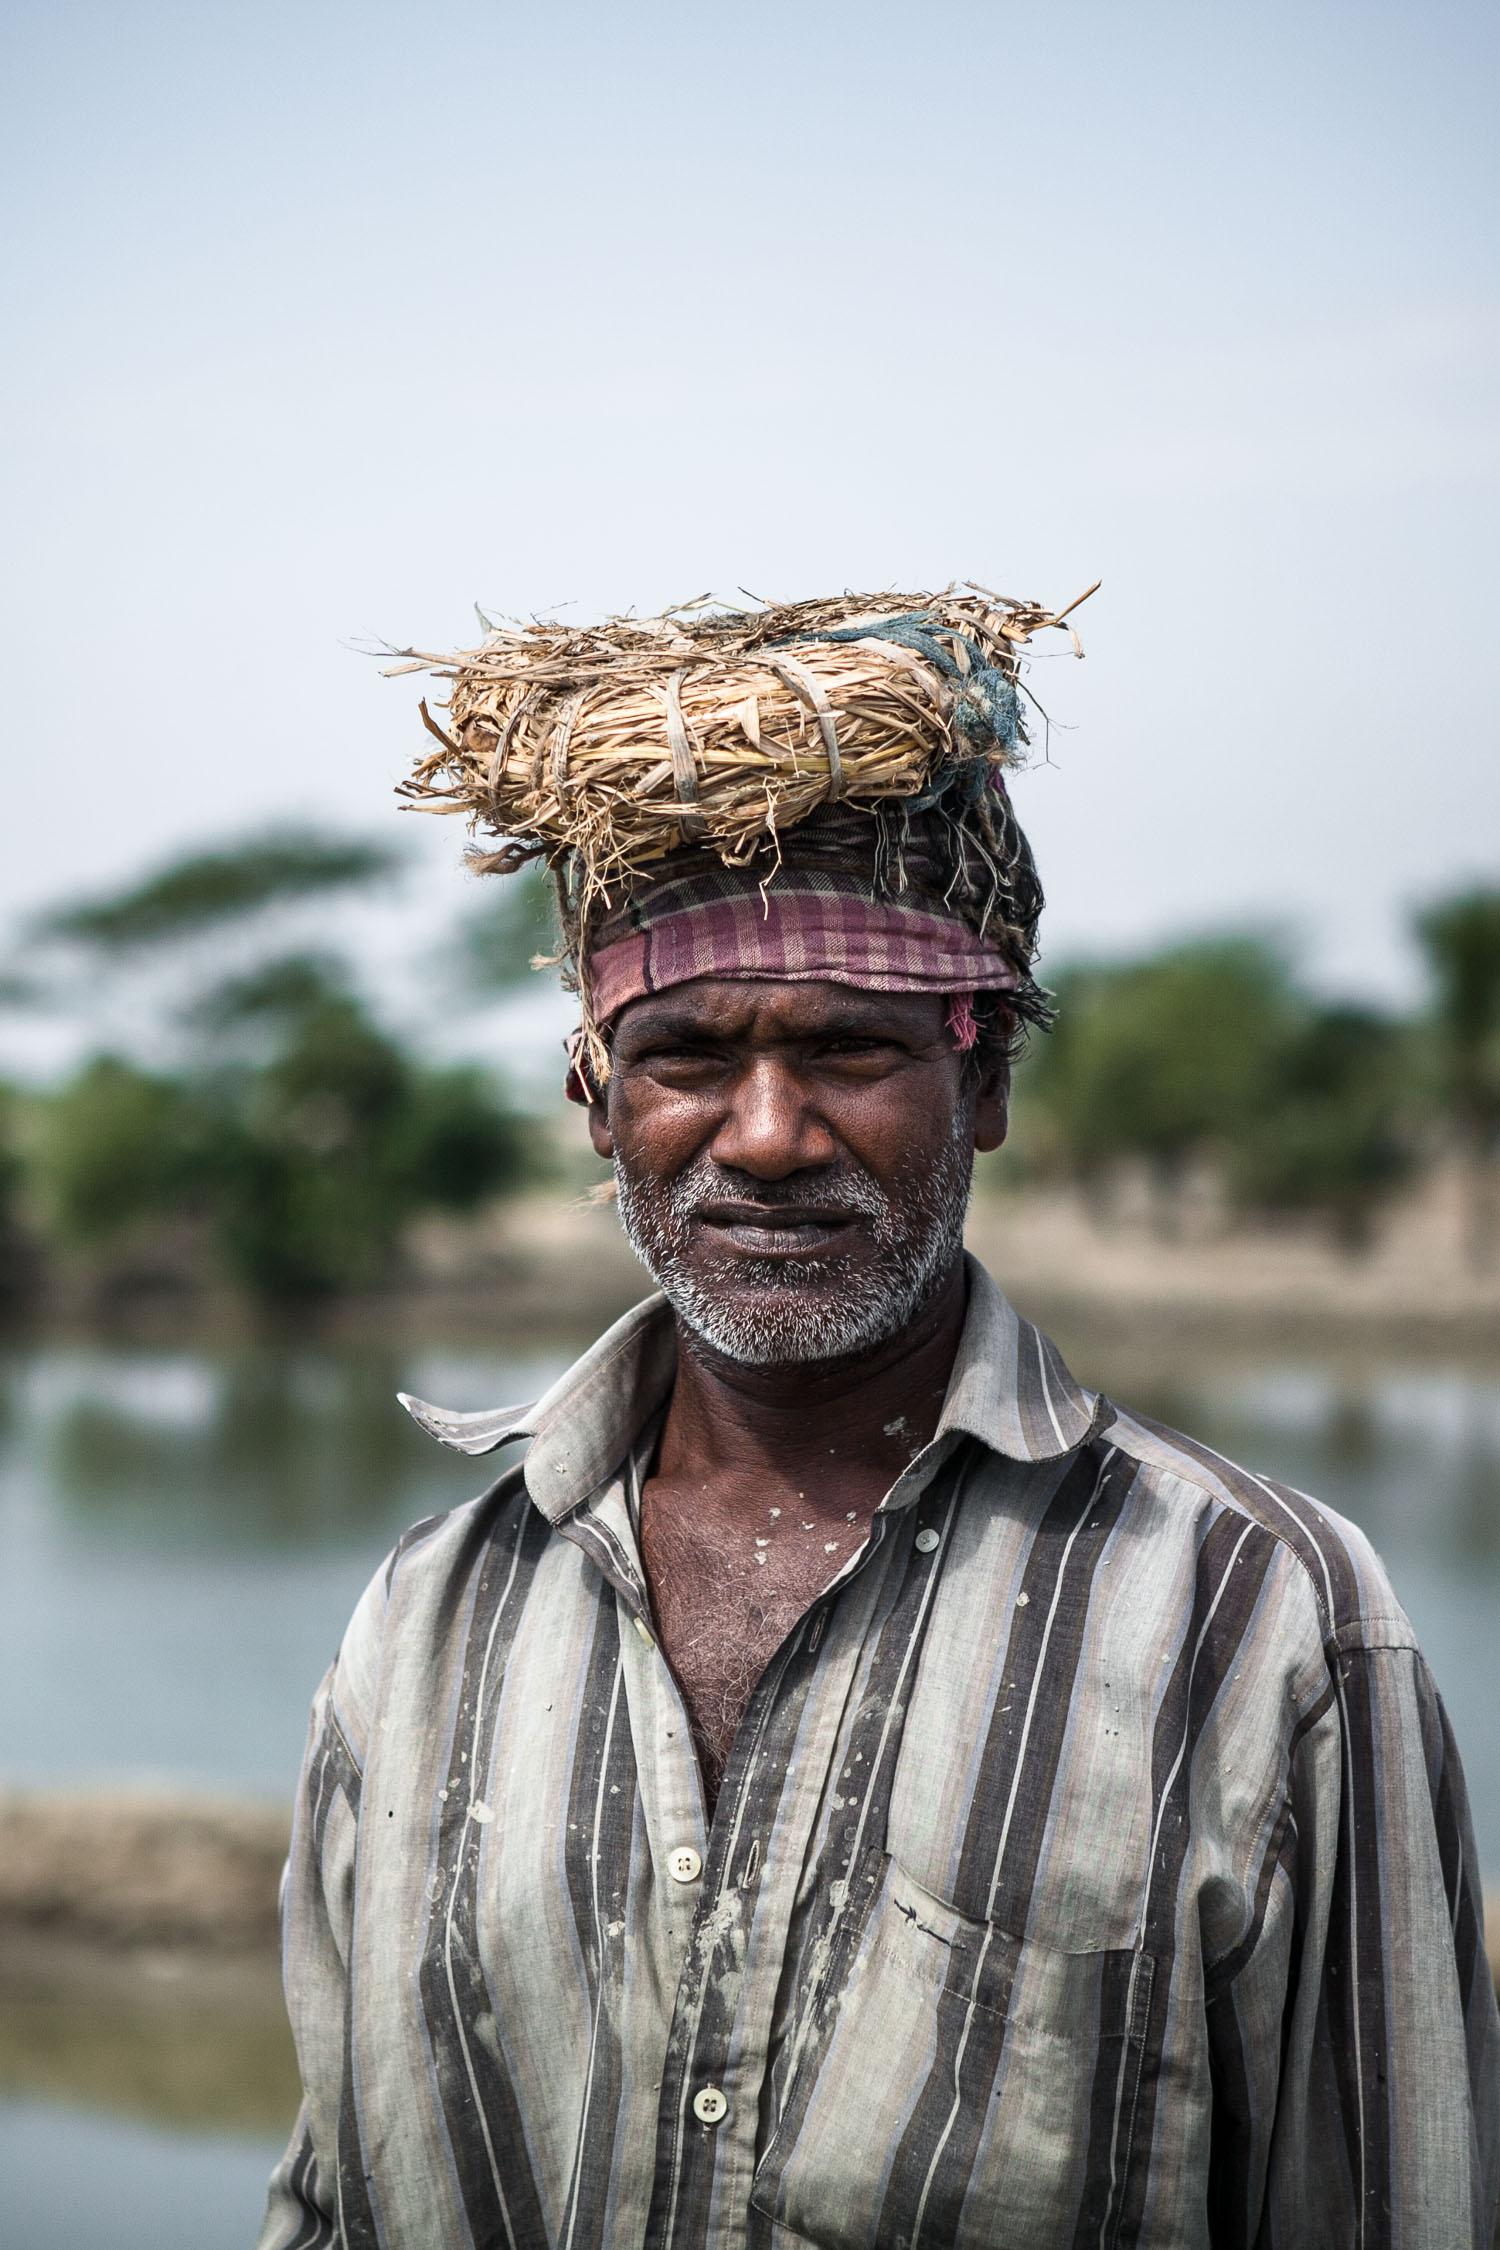 climate-migrants-bangladesh-maria-litwa-3531.jpg